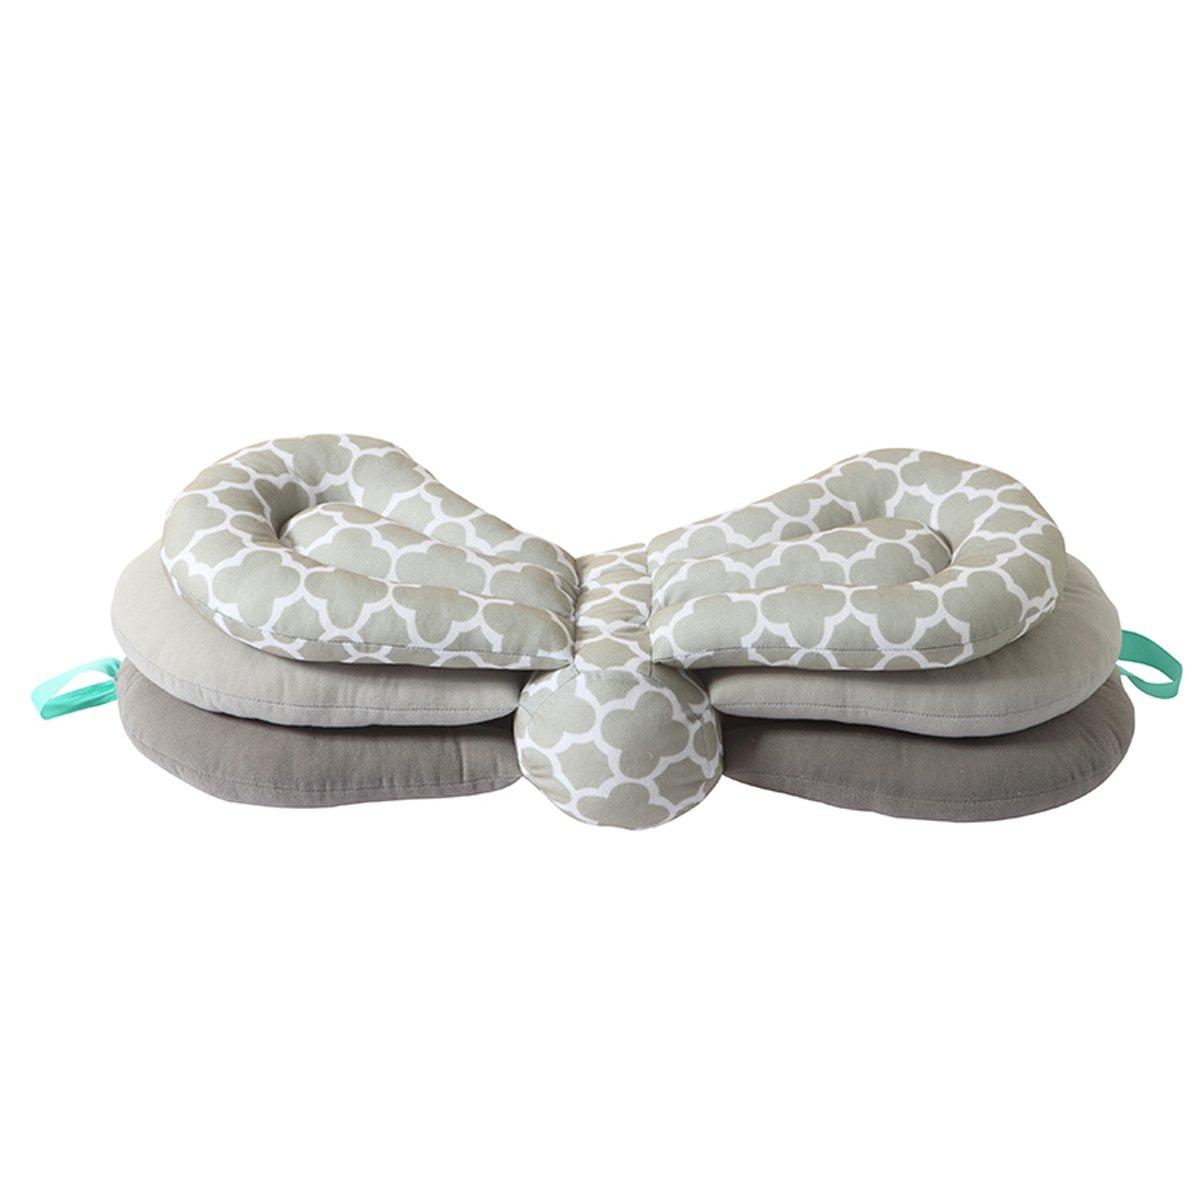 Nursing Pillow, Soft Maternity Feeding Adjustable Breastfeeding Nursing Pillow ASAND-H